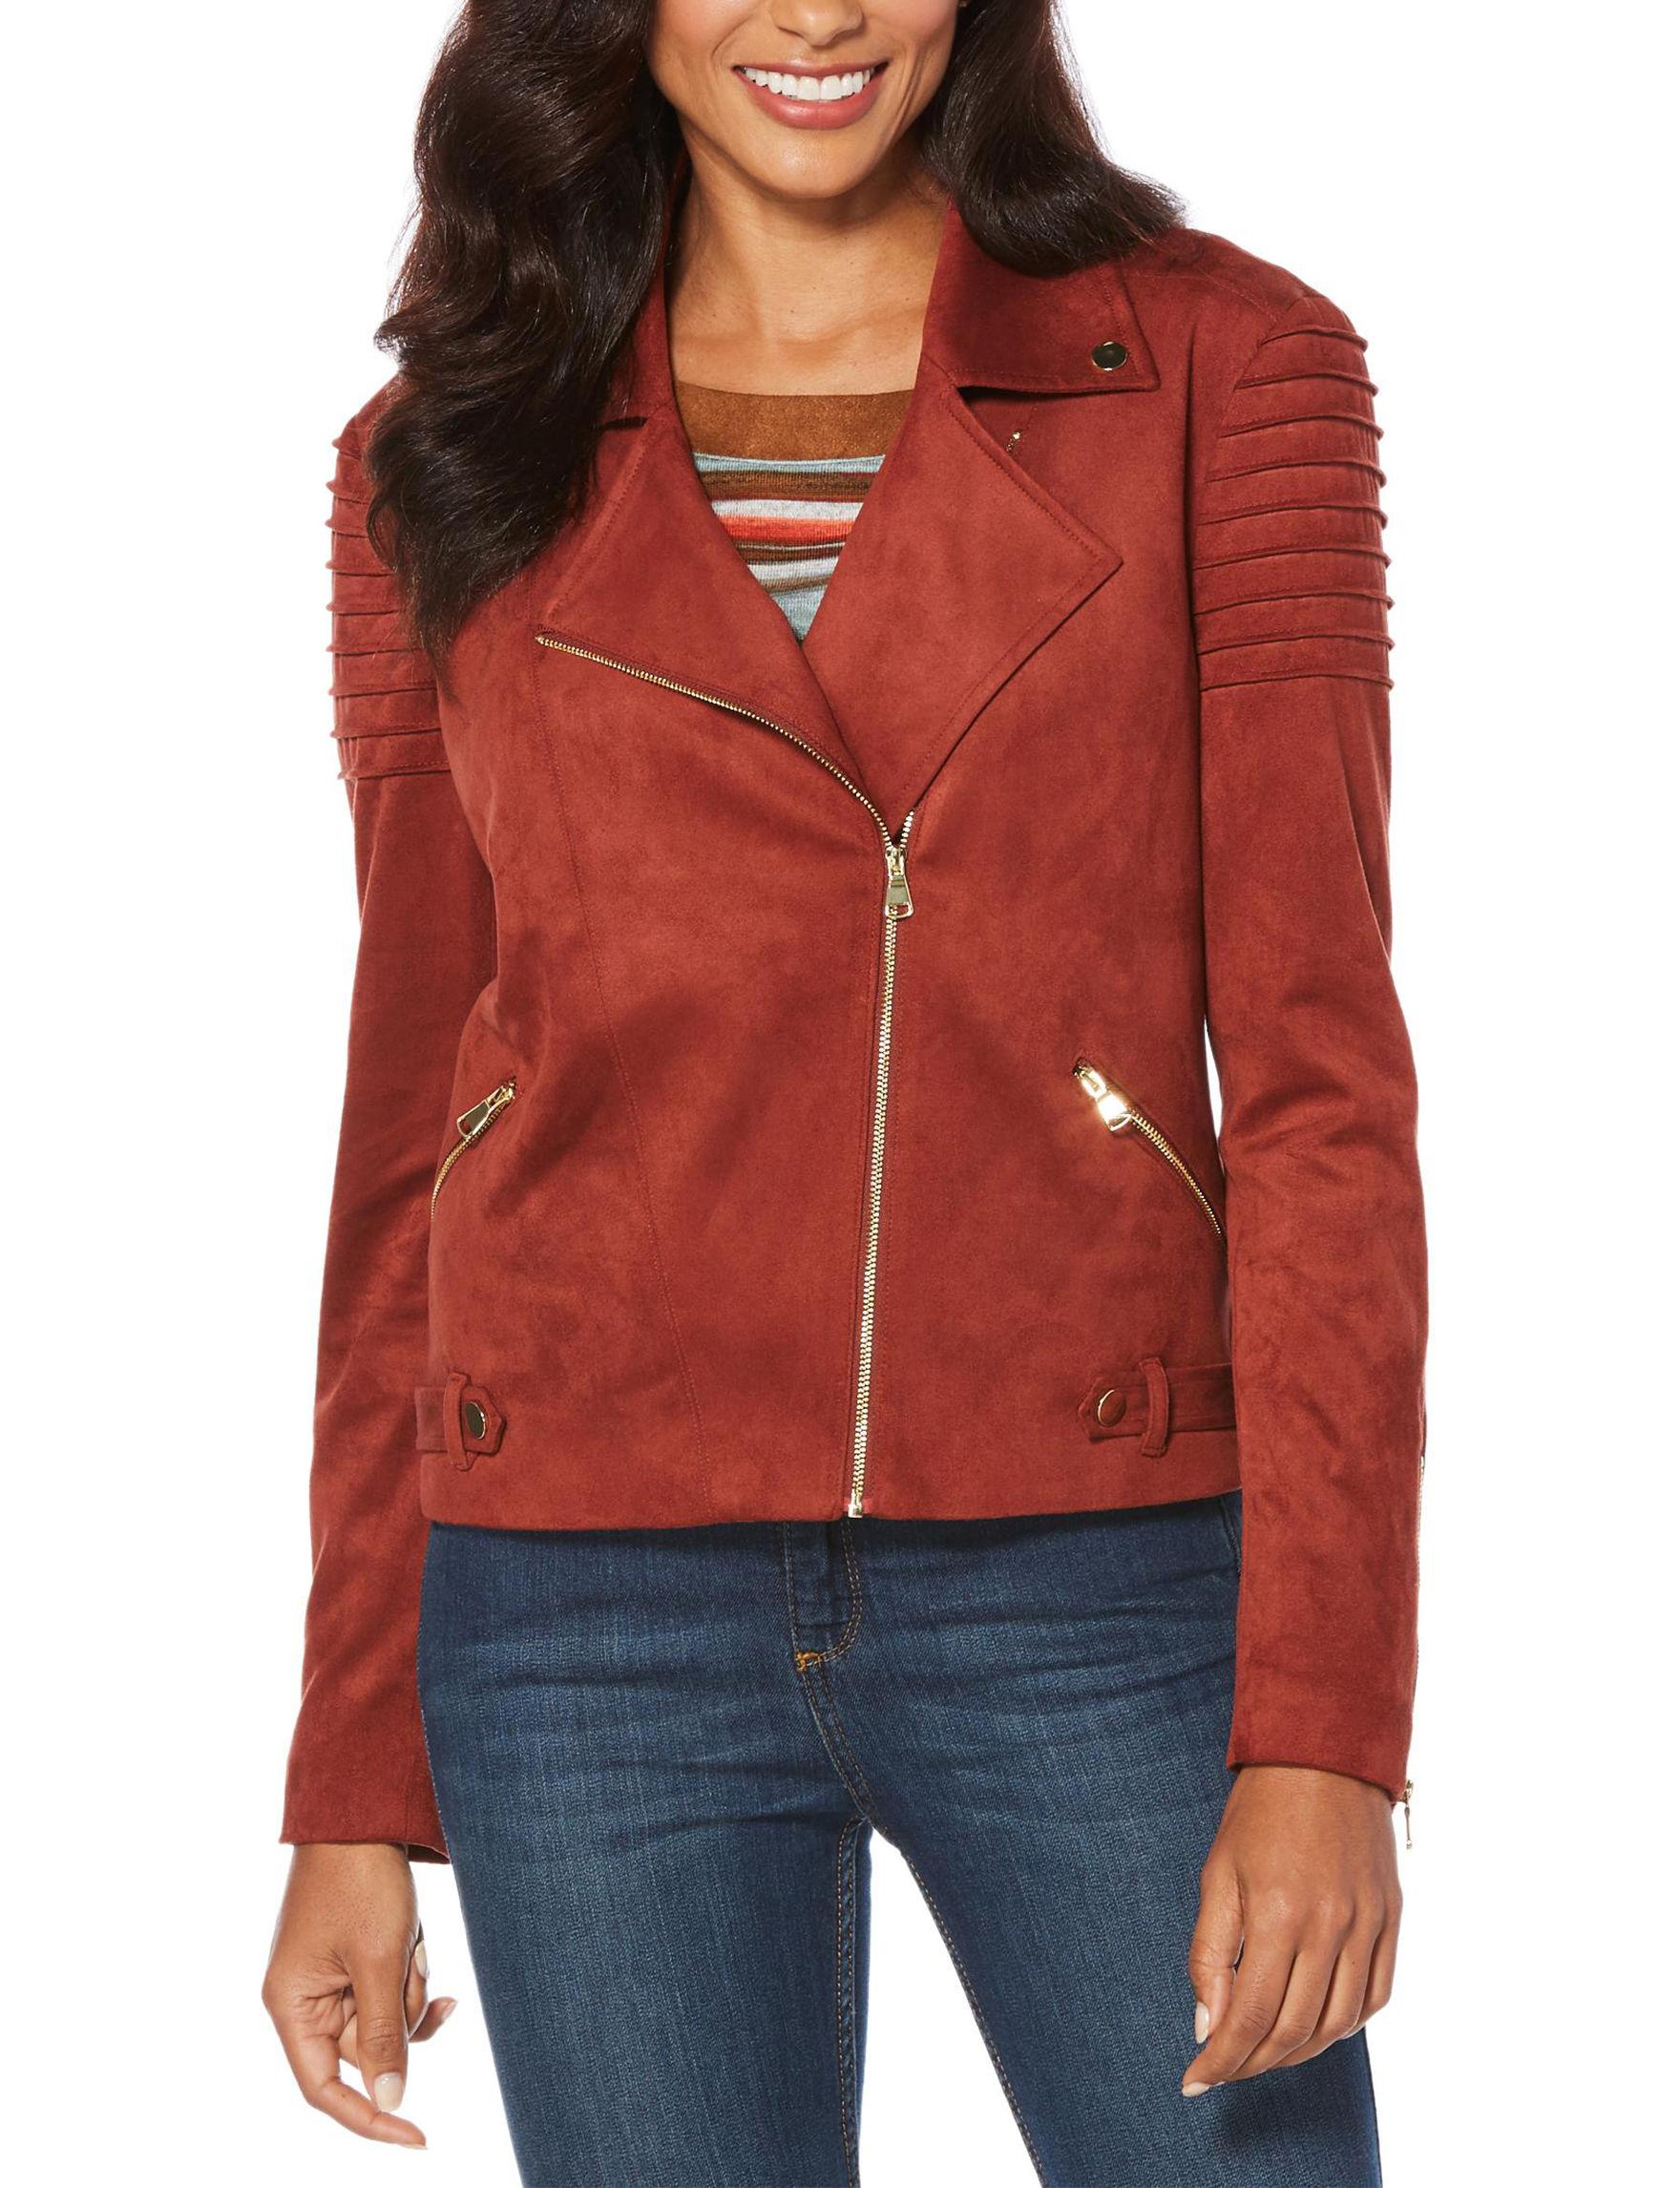 Rafaella Red Lightweight Jackets & Blazers